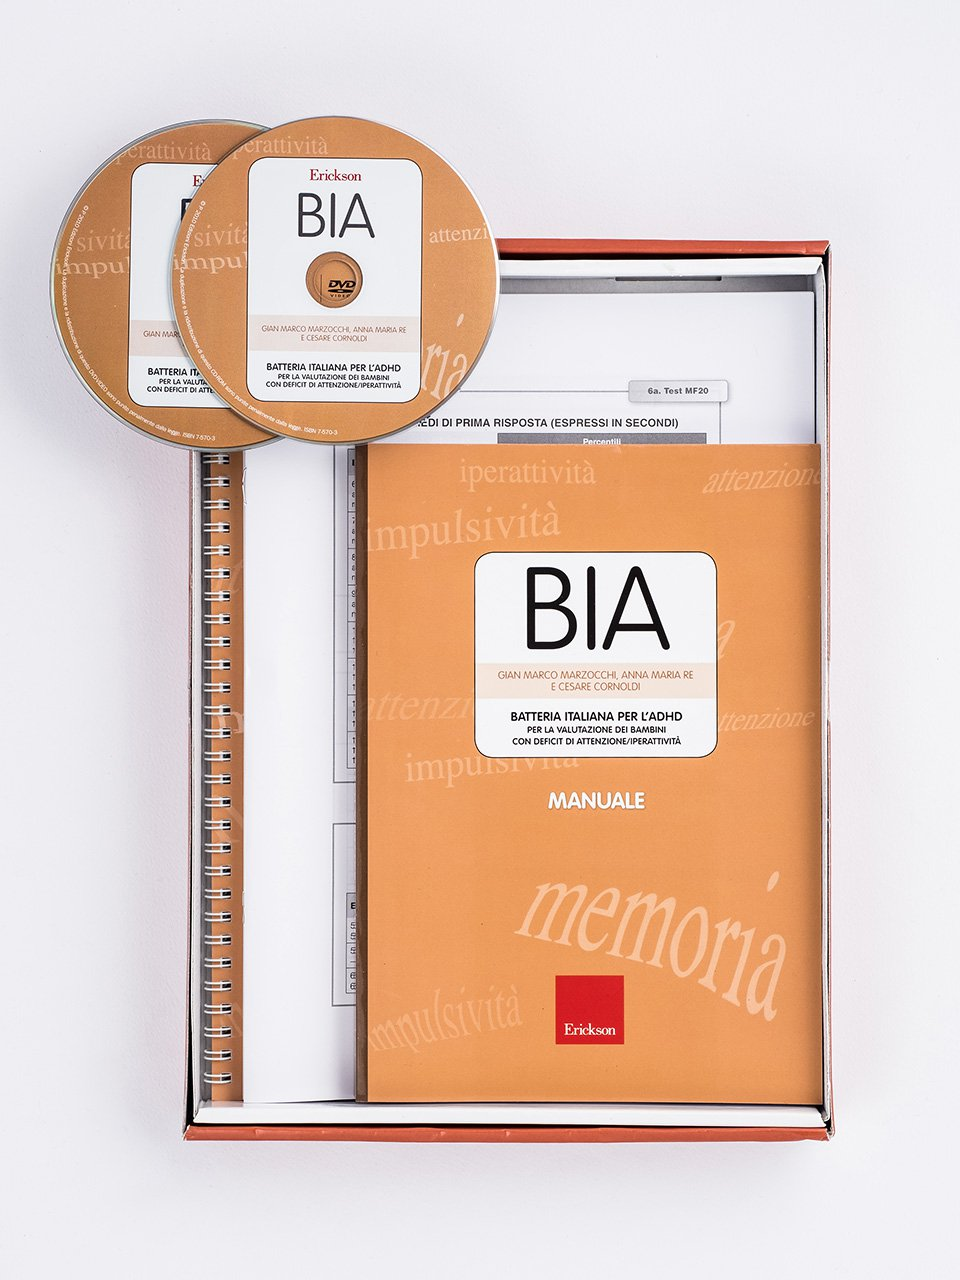 BIA - Batteria italiana per l'ADHD - Libri - Erickson 2